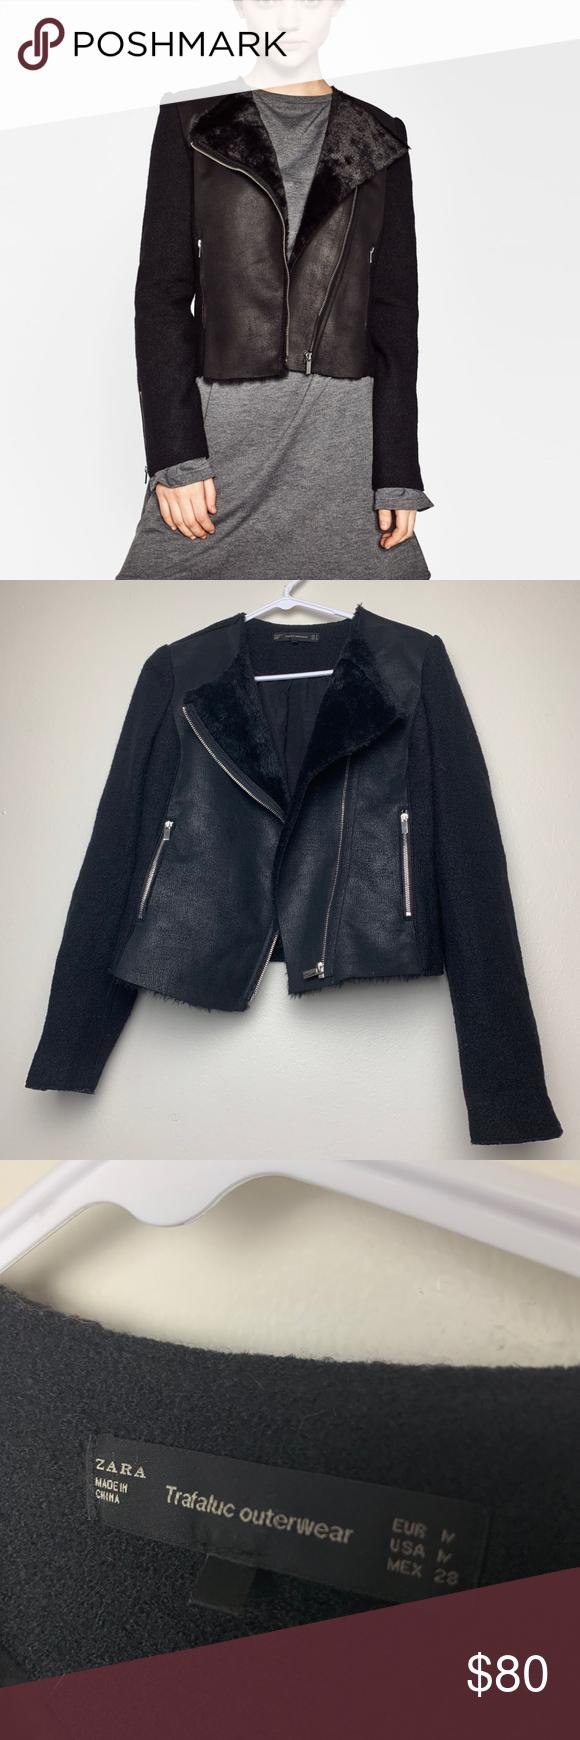 Zara Trf Faux Leather Fur Moto Jacket In Amazing And Clean Condition So Warm Zara Jackets Coats Clothes Design Zara Fashion [ 1740 x 580 Pixel ]